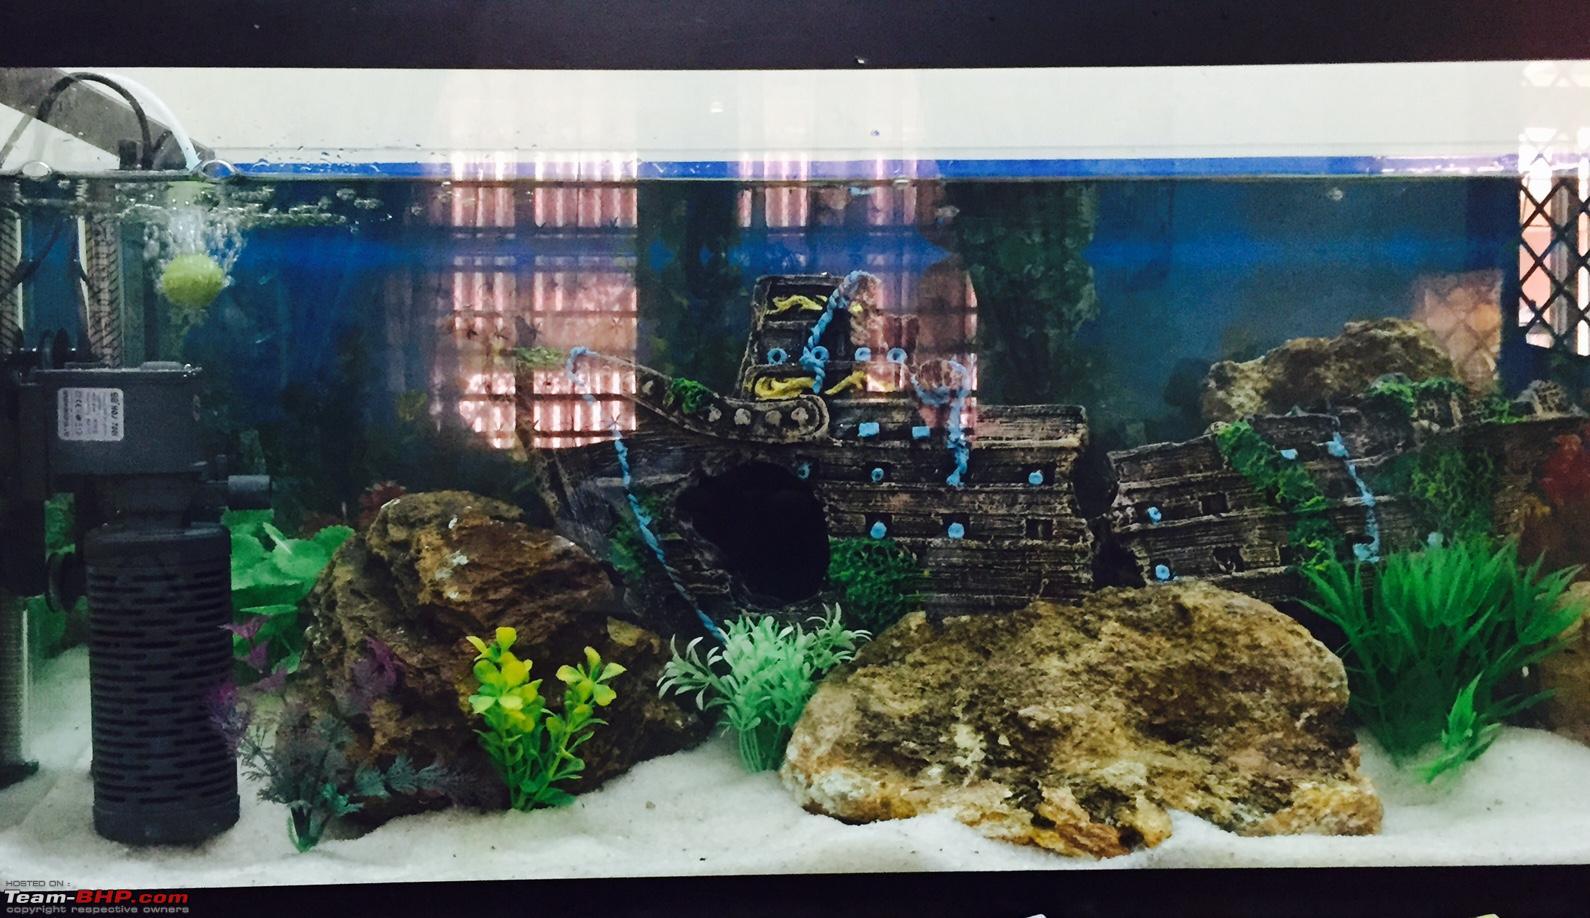 Fish aquarium in gurgaon - My Fishkeeping Hobby Fullsizerender Jpg